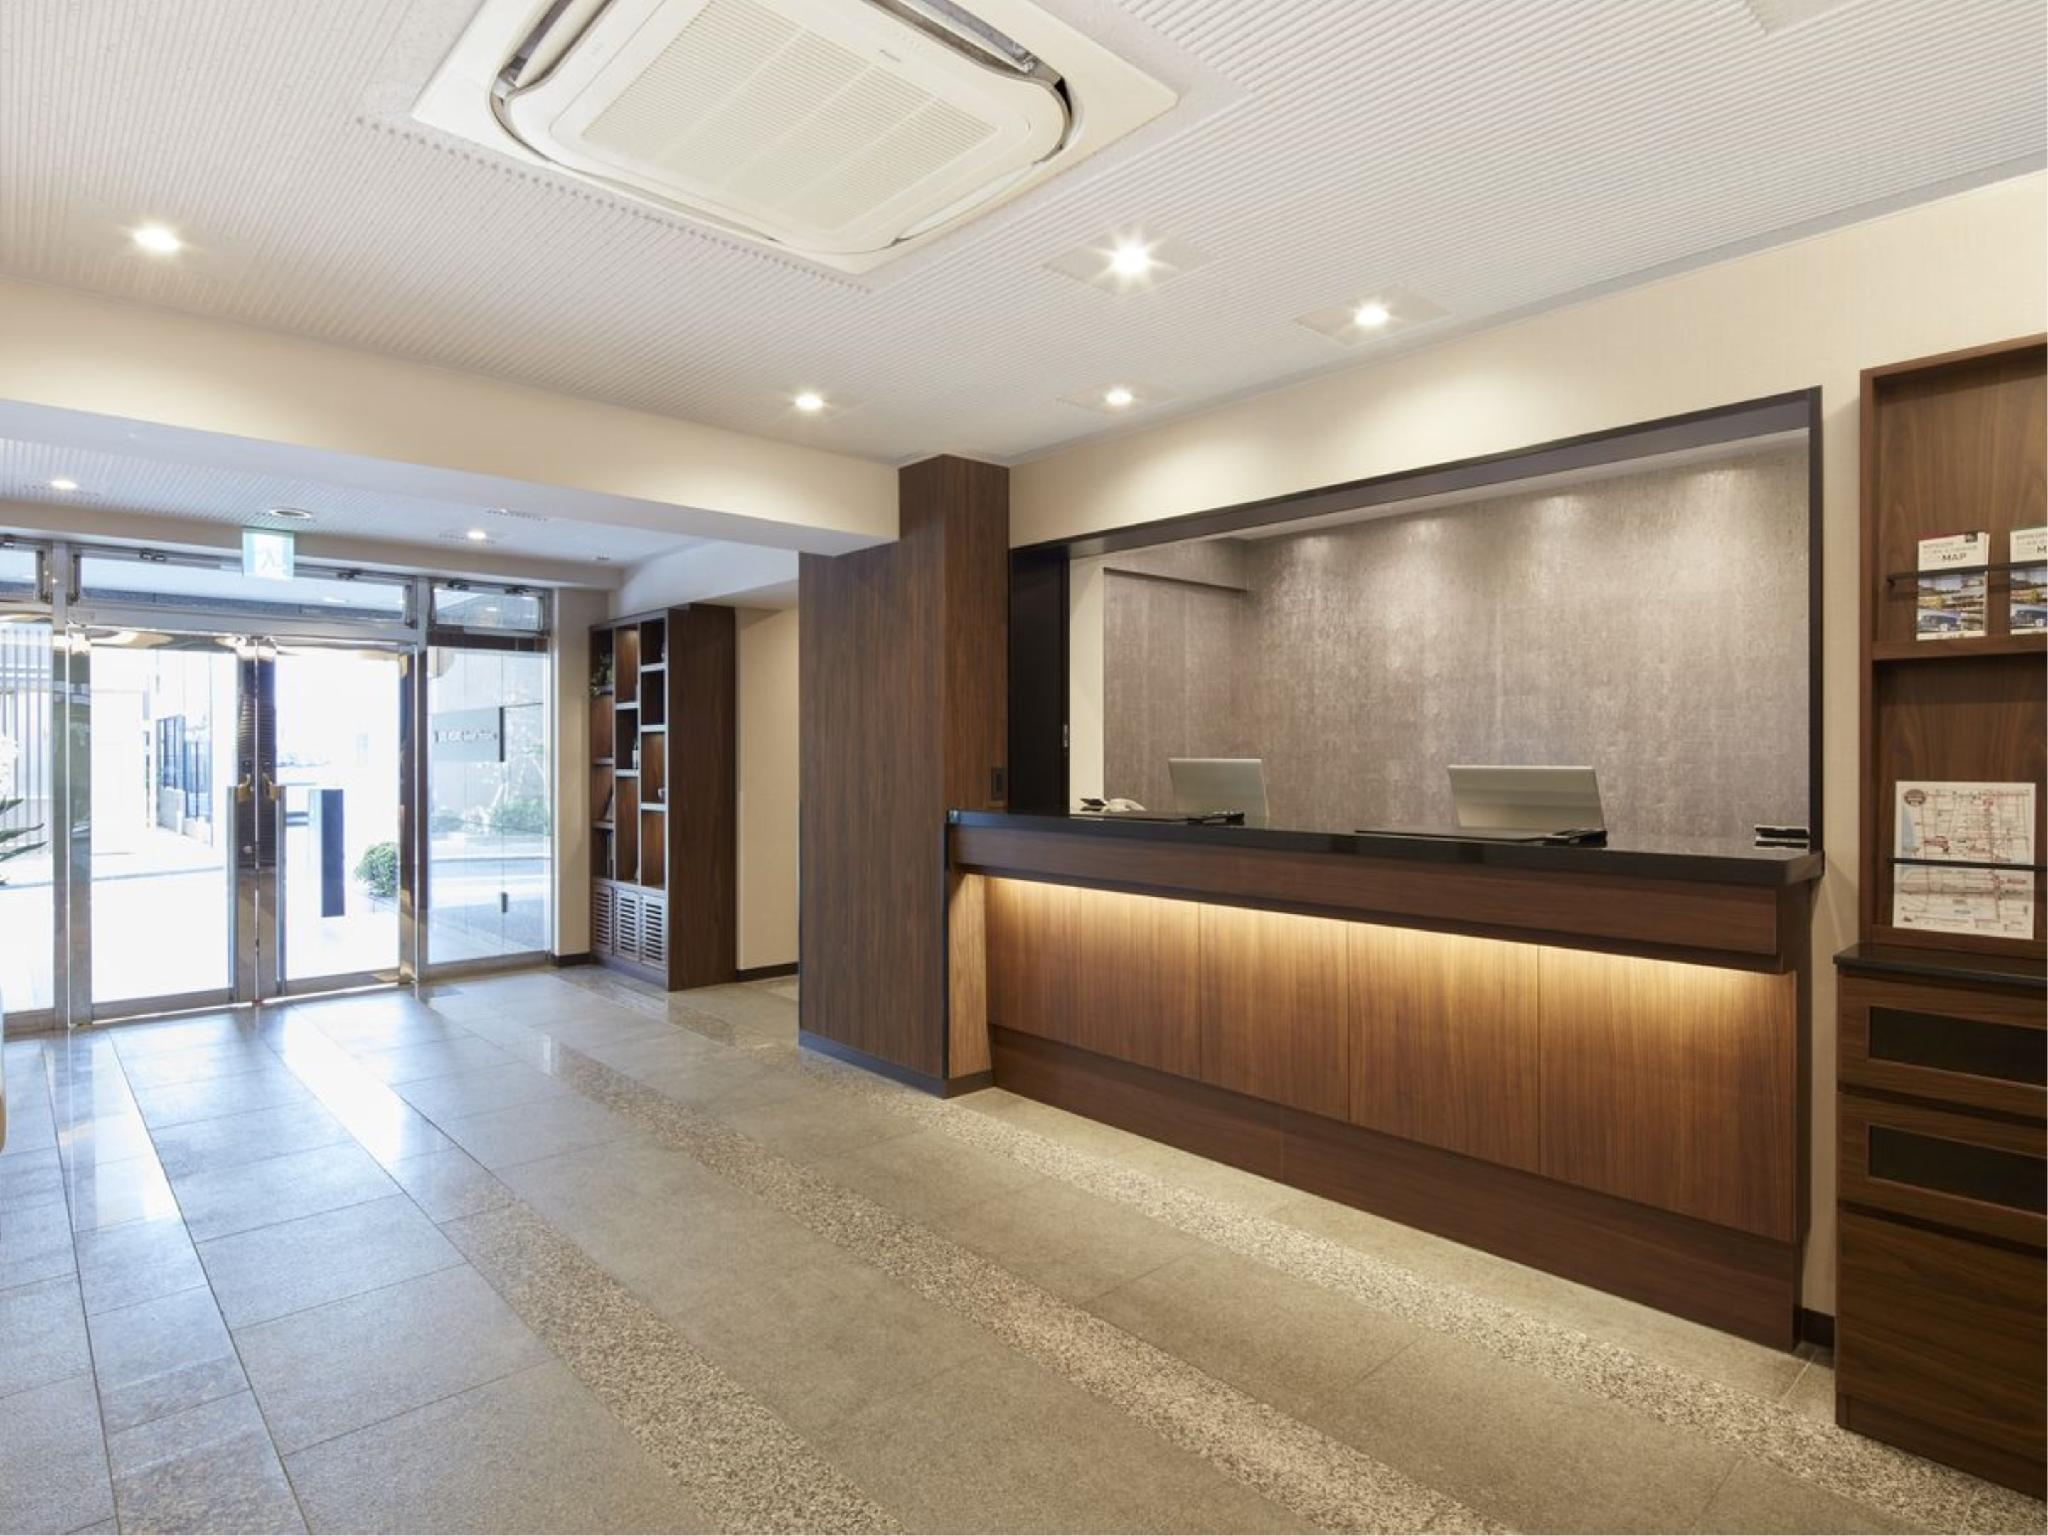 Hotel MyStays Kiyosumi Shirakawa  Formerly  Flexstay Inn Kiyosumi Shirakawa